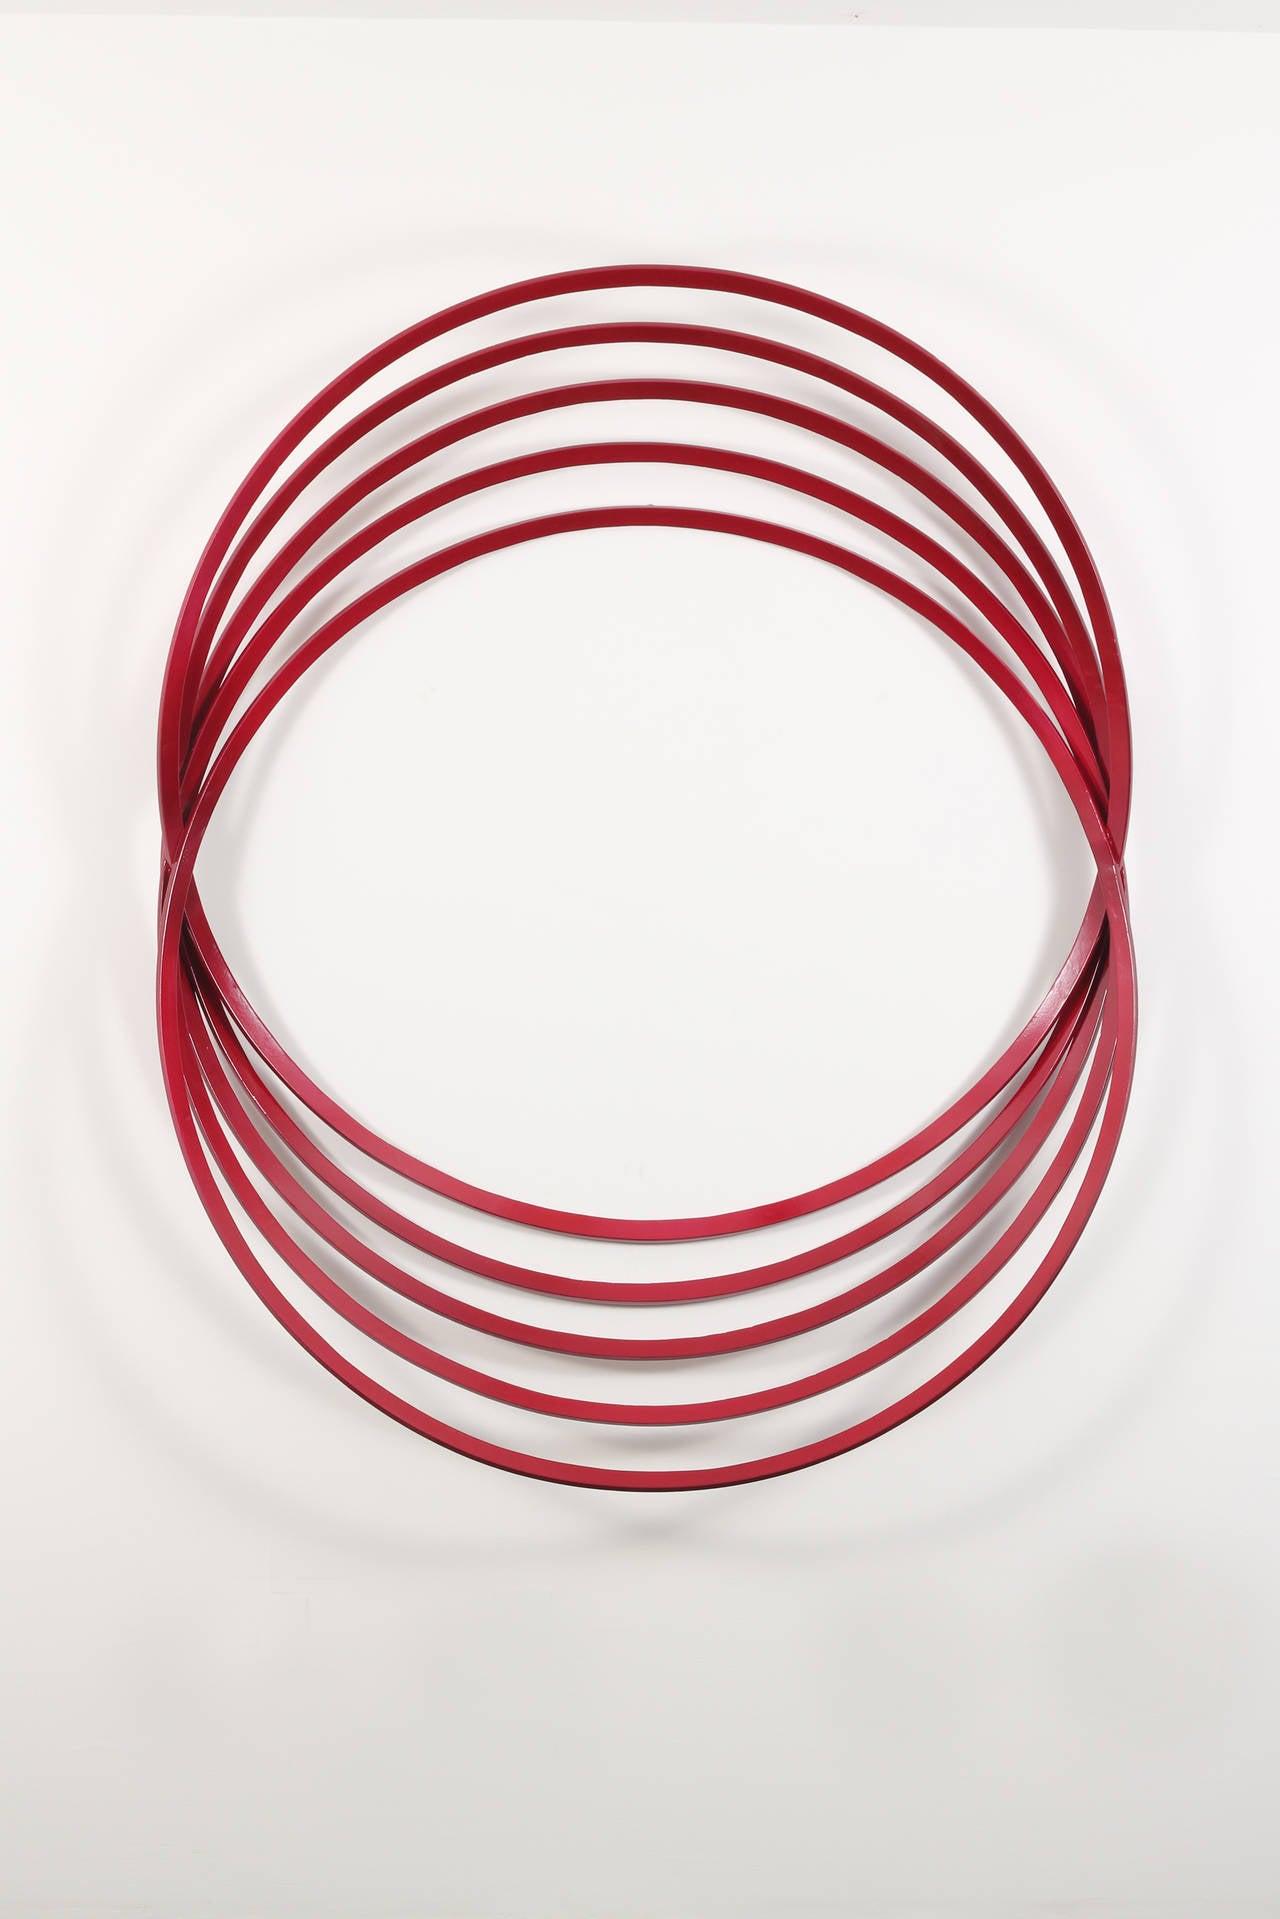 Erratic Color Red